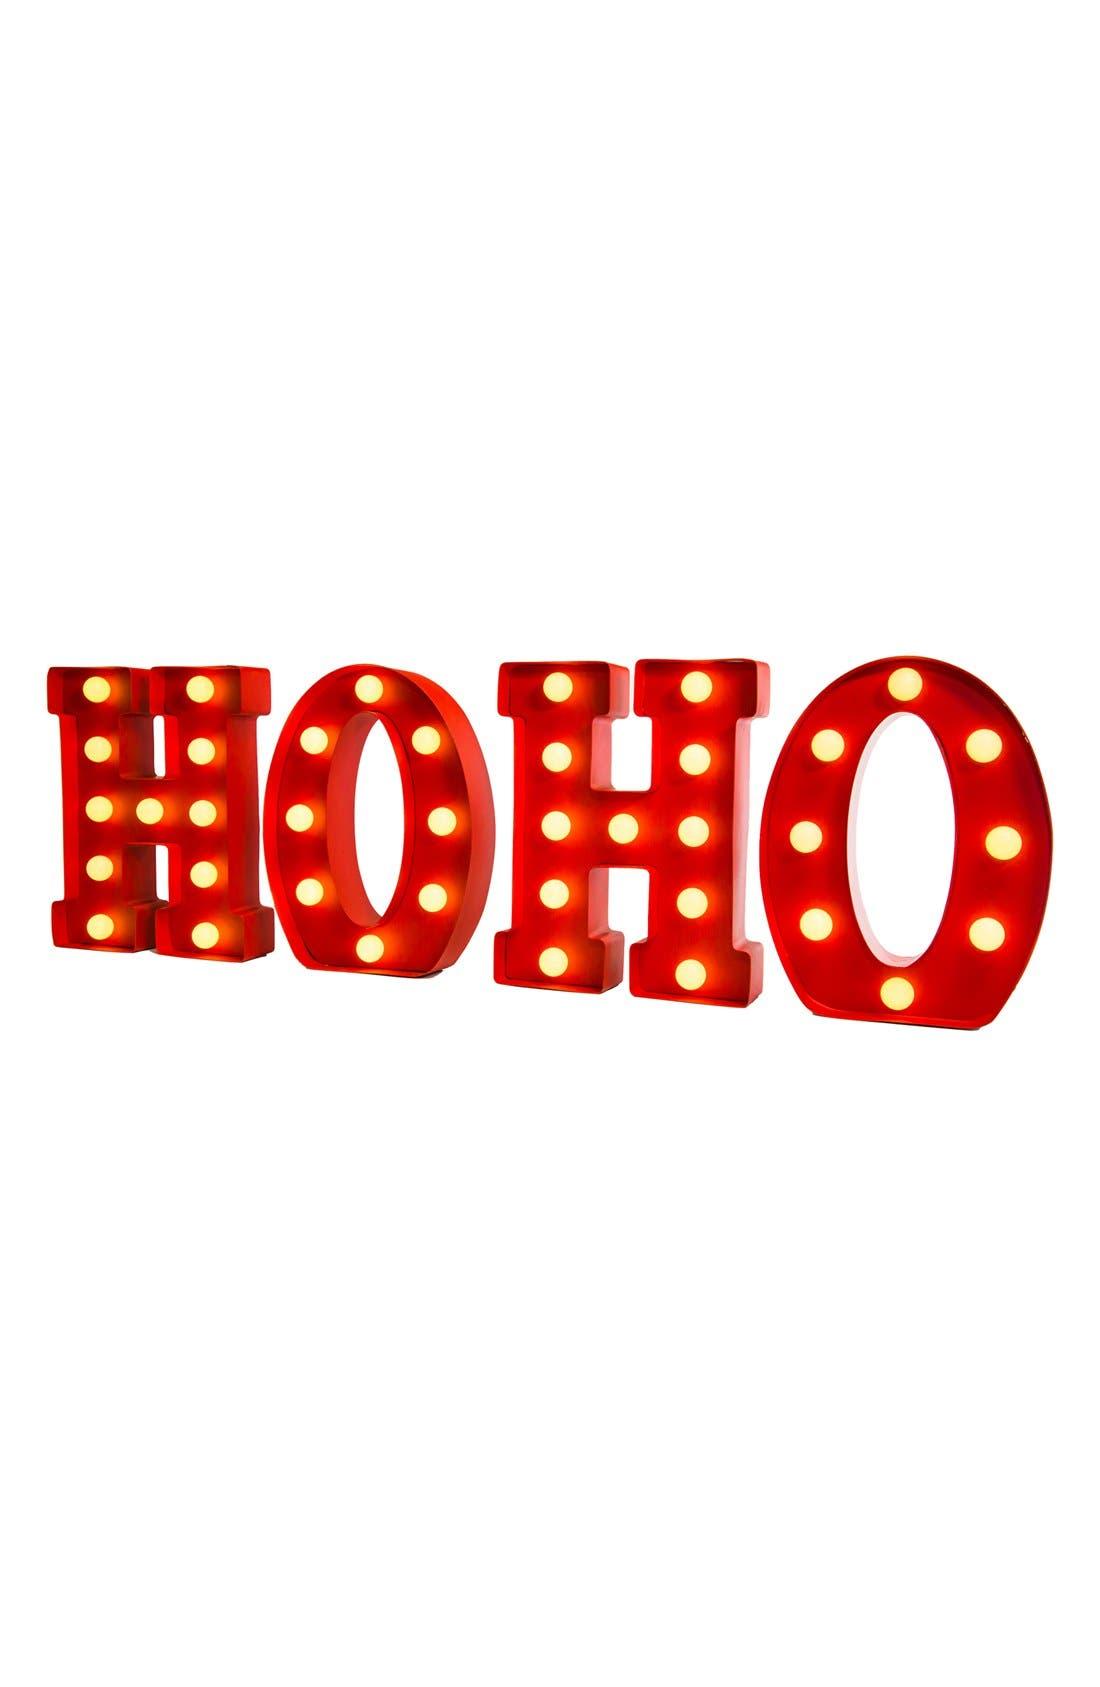 Main Image - Mr. Christmas Light Up 'Ho Ho' Marquee